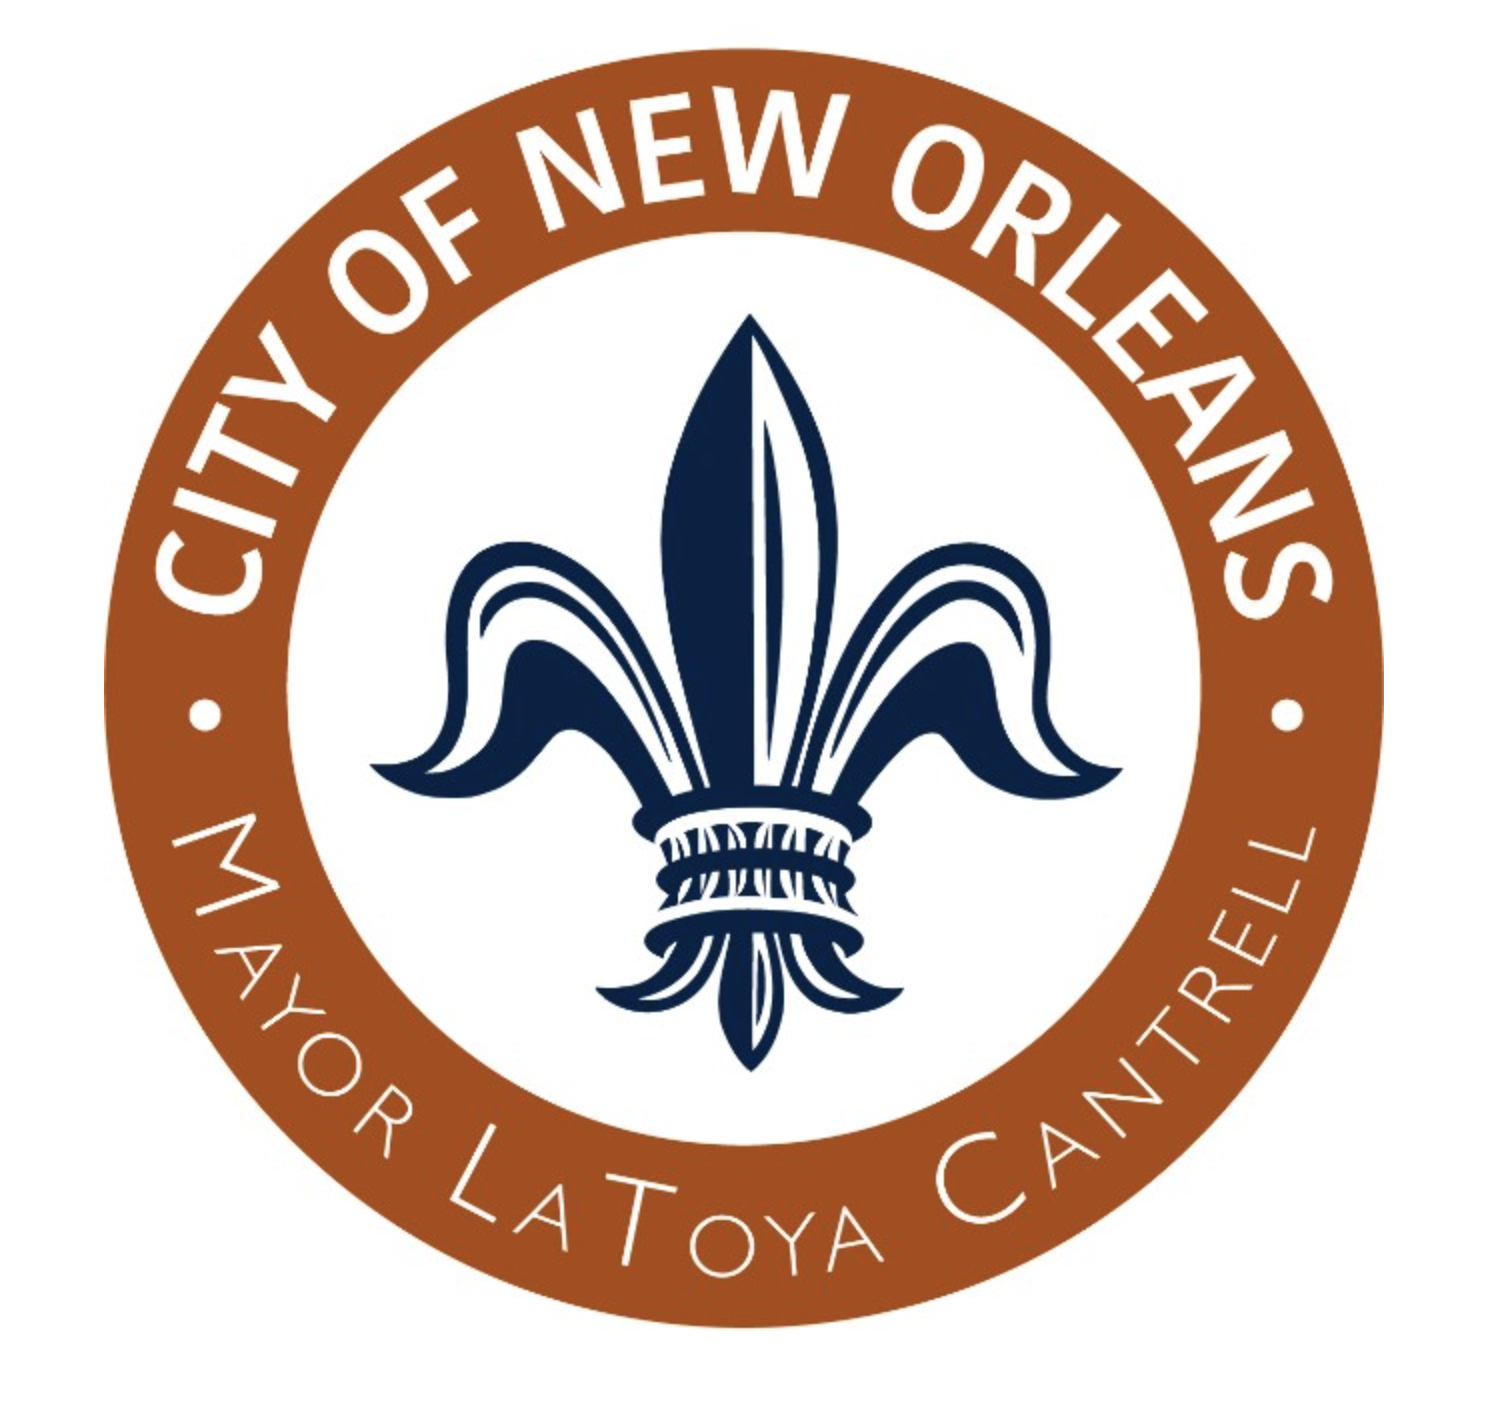 City of New Orleans Mayor LaToya Cantrell